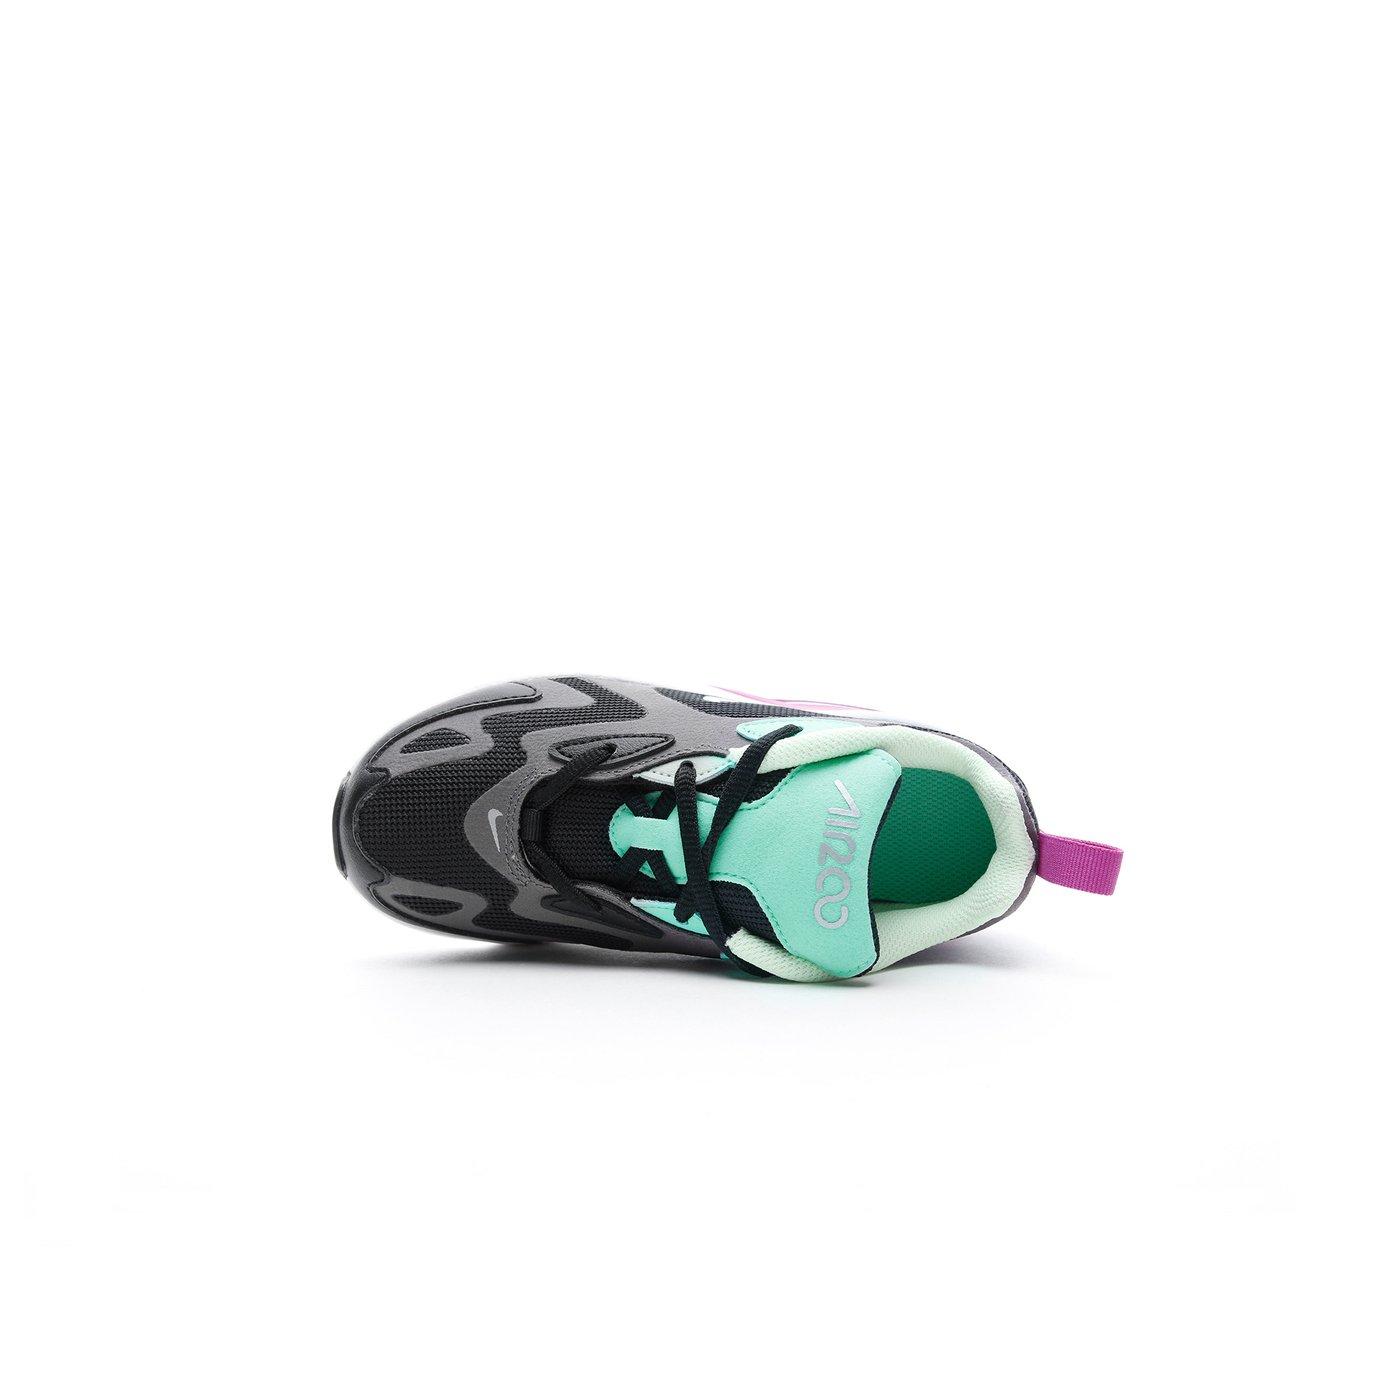 Nike Air Max 200 Siyah Çocuk Spor Ayakkabı